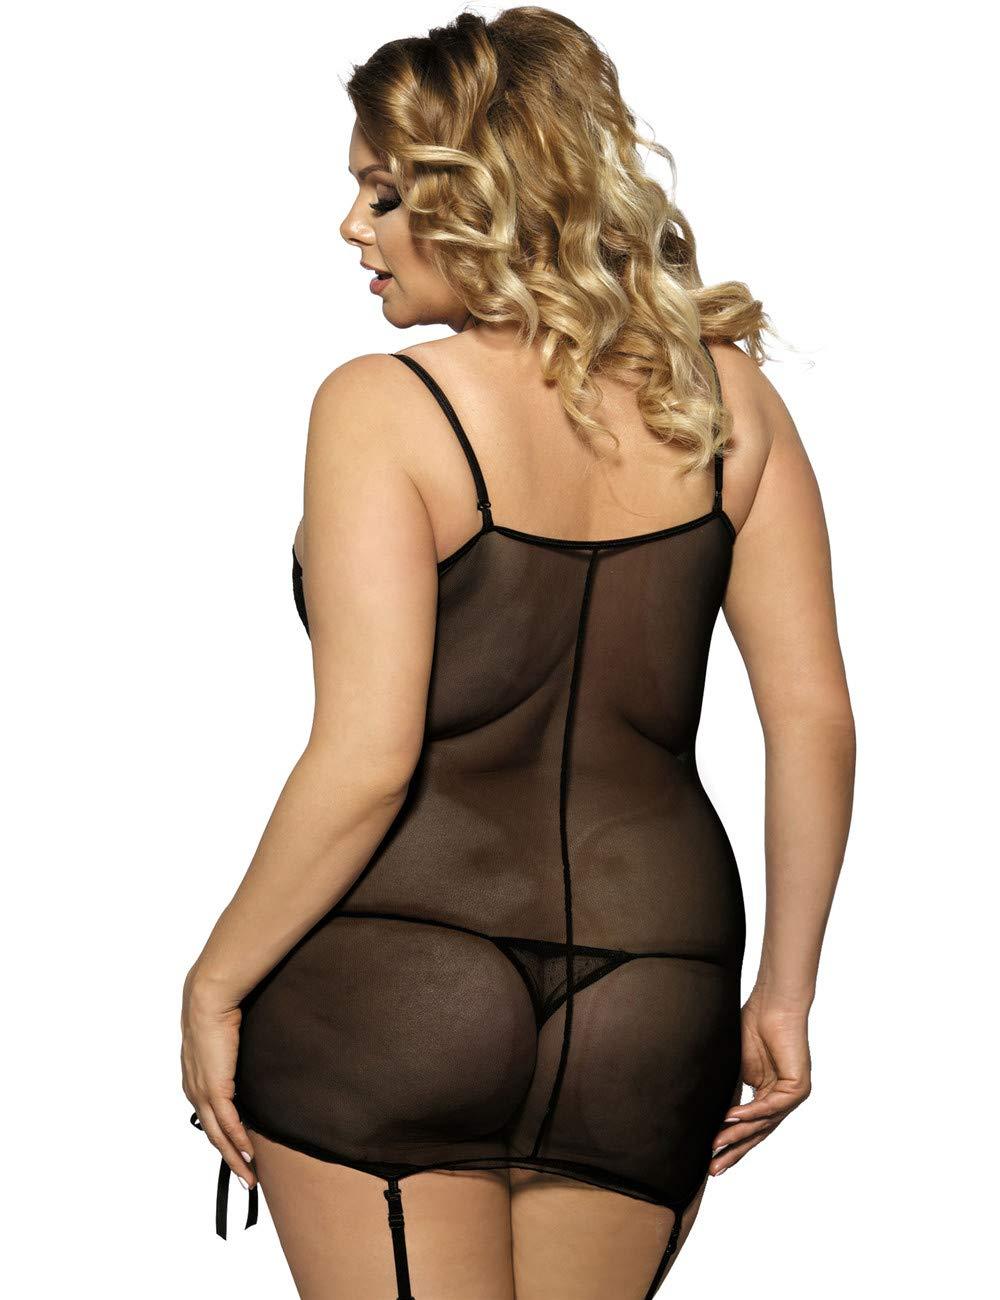 Ropa erótica FMY Lencería erótica Sexy Sling Sling Sling Pijamas Encaje Mujeres Transparentes Seductor Liguero Conjunto de Tanga - Múltiples Opciones de tamaño (Tamaño : 2XL) 620b52